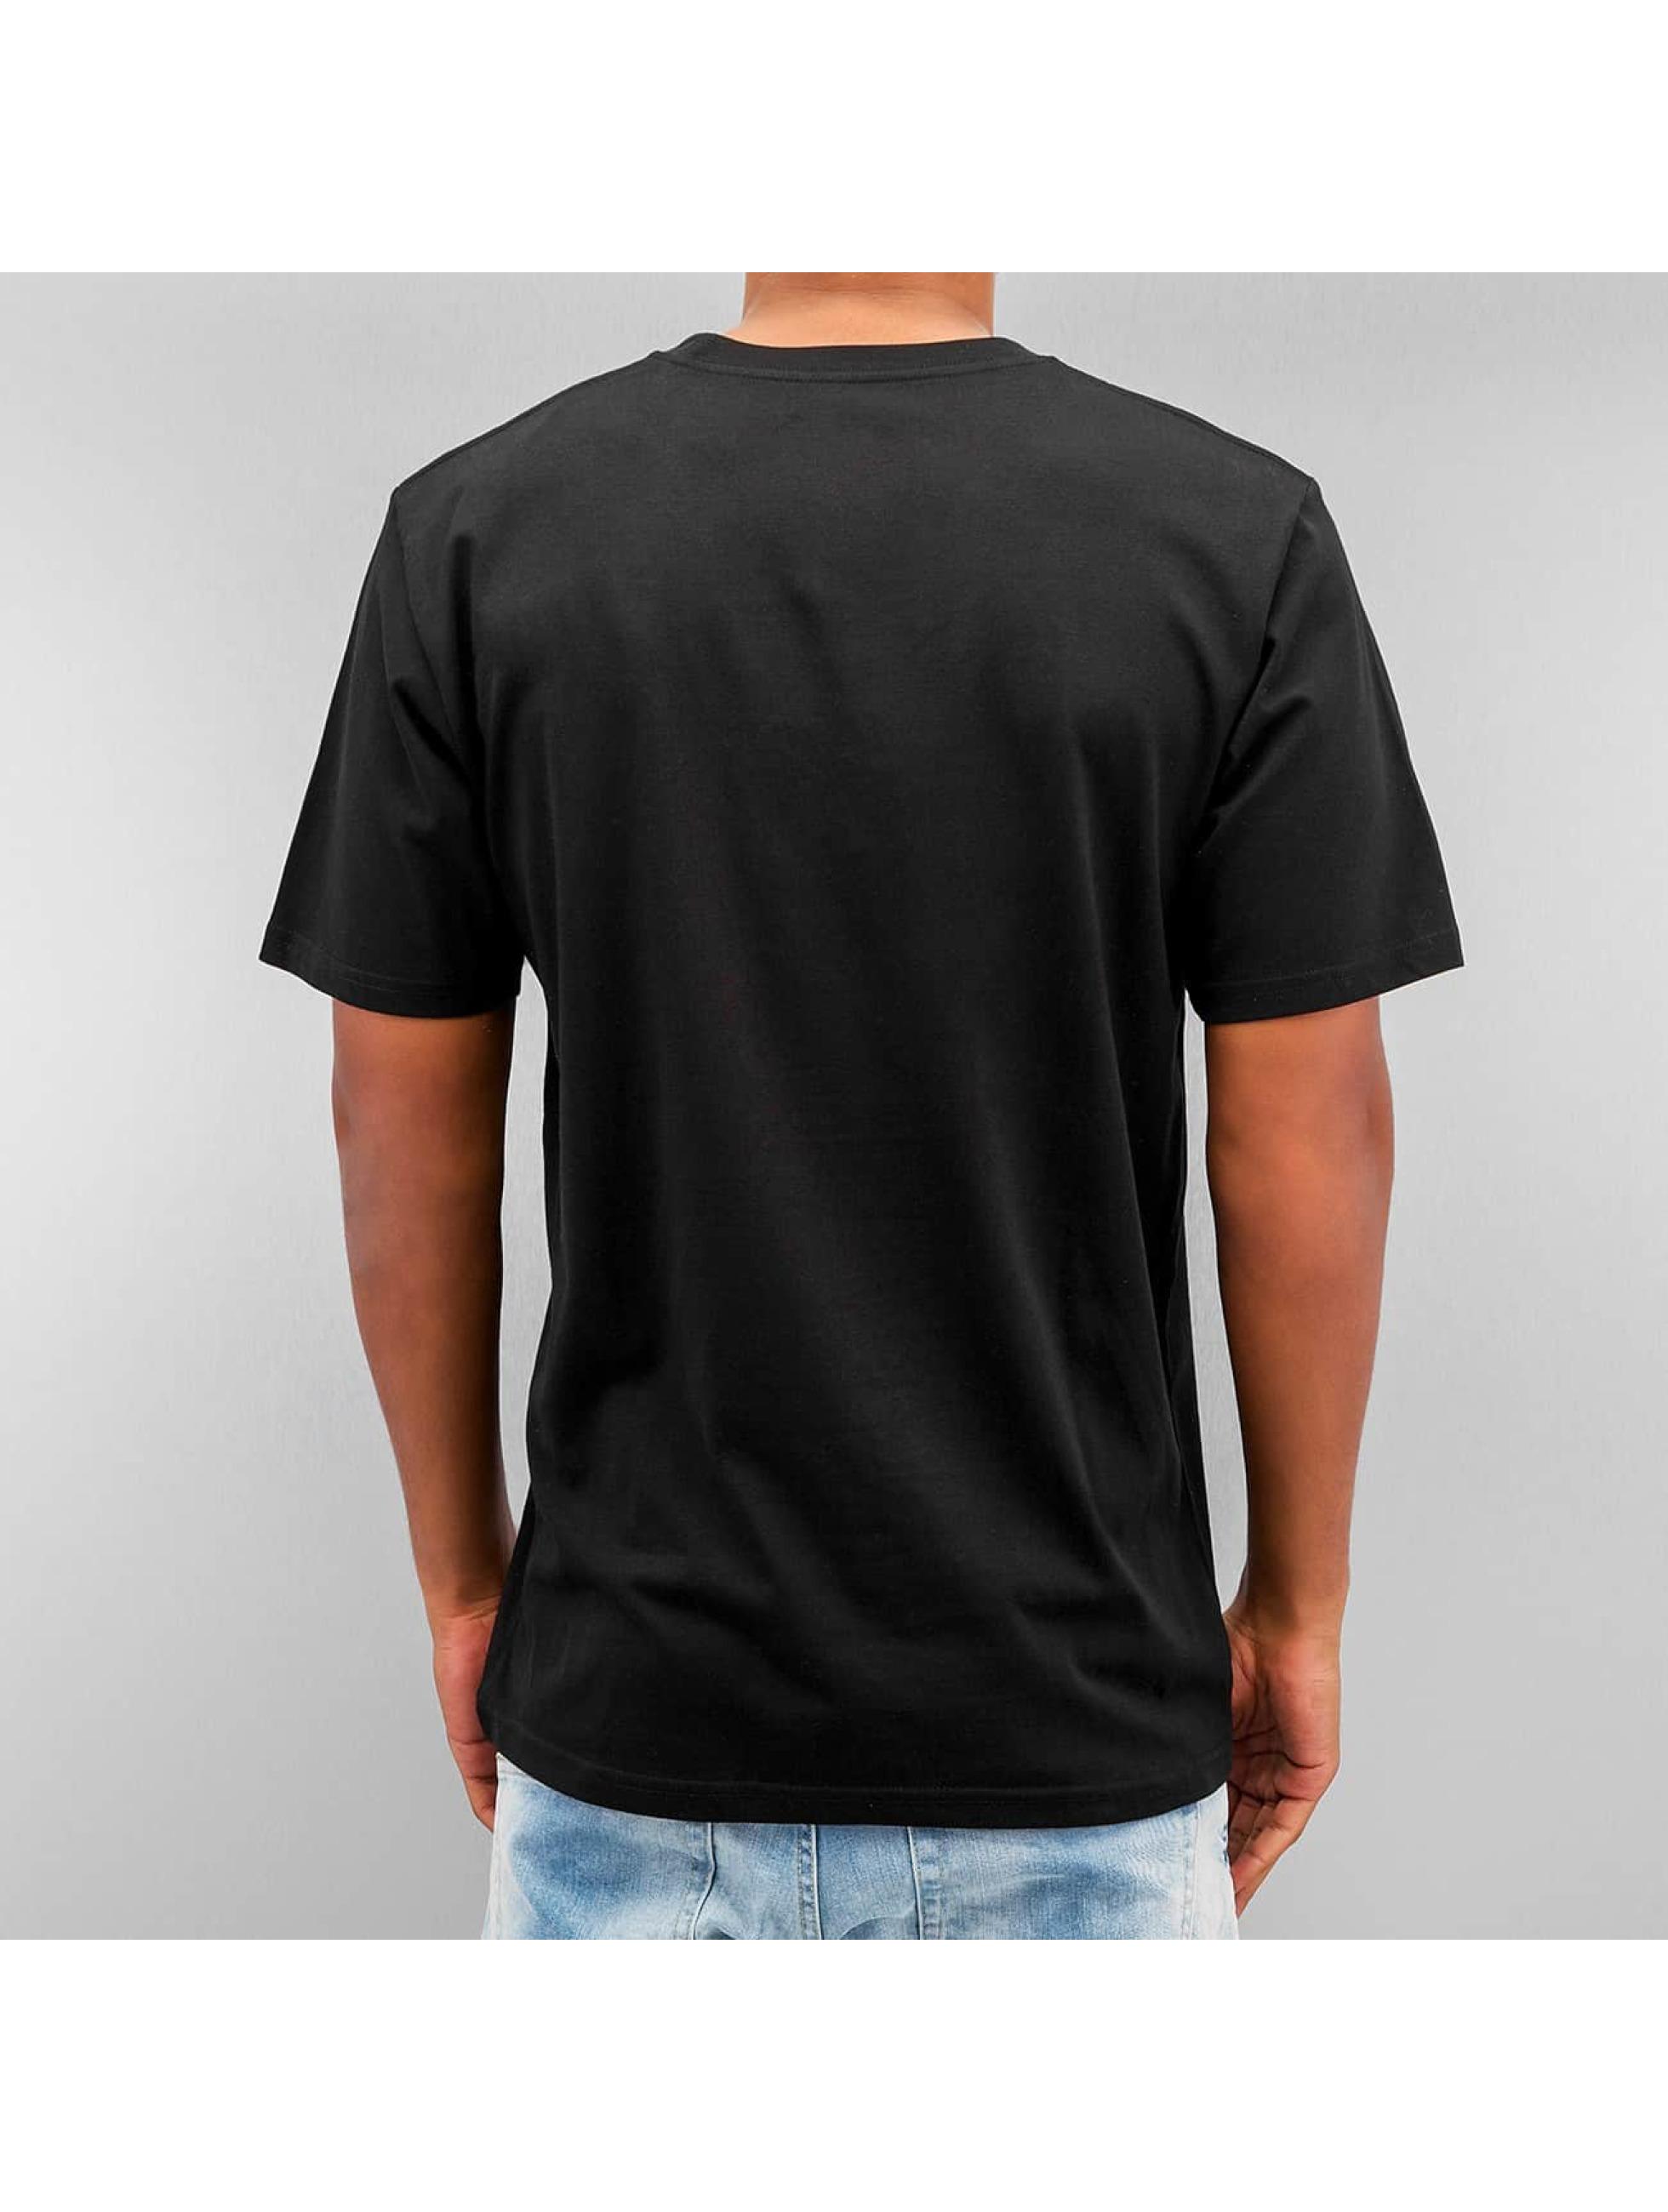 Carhartt WIP T-Shirt S/S Wip Script schwarz